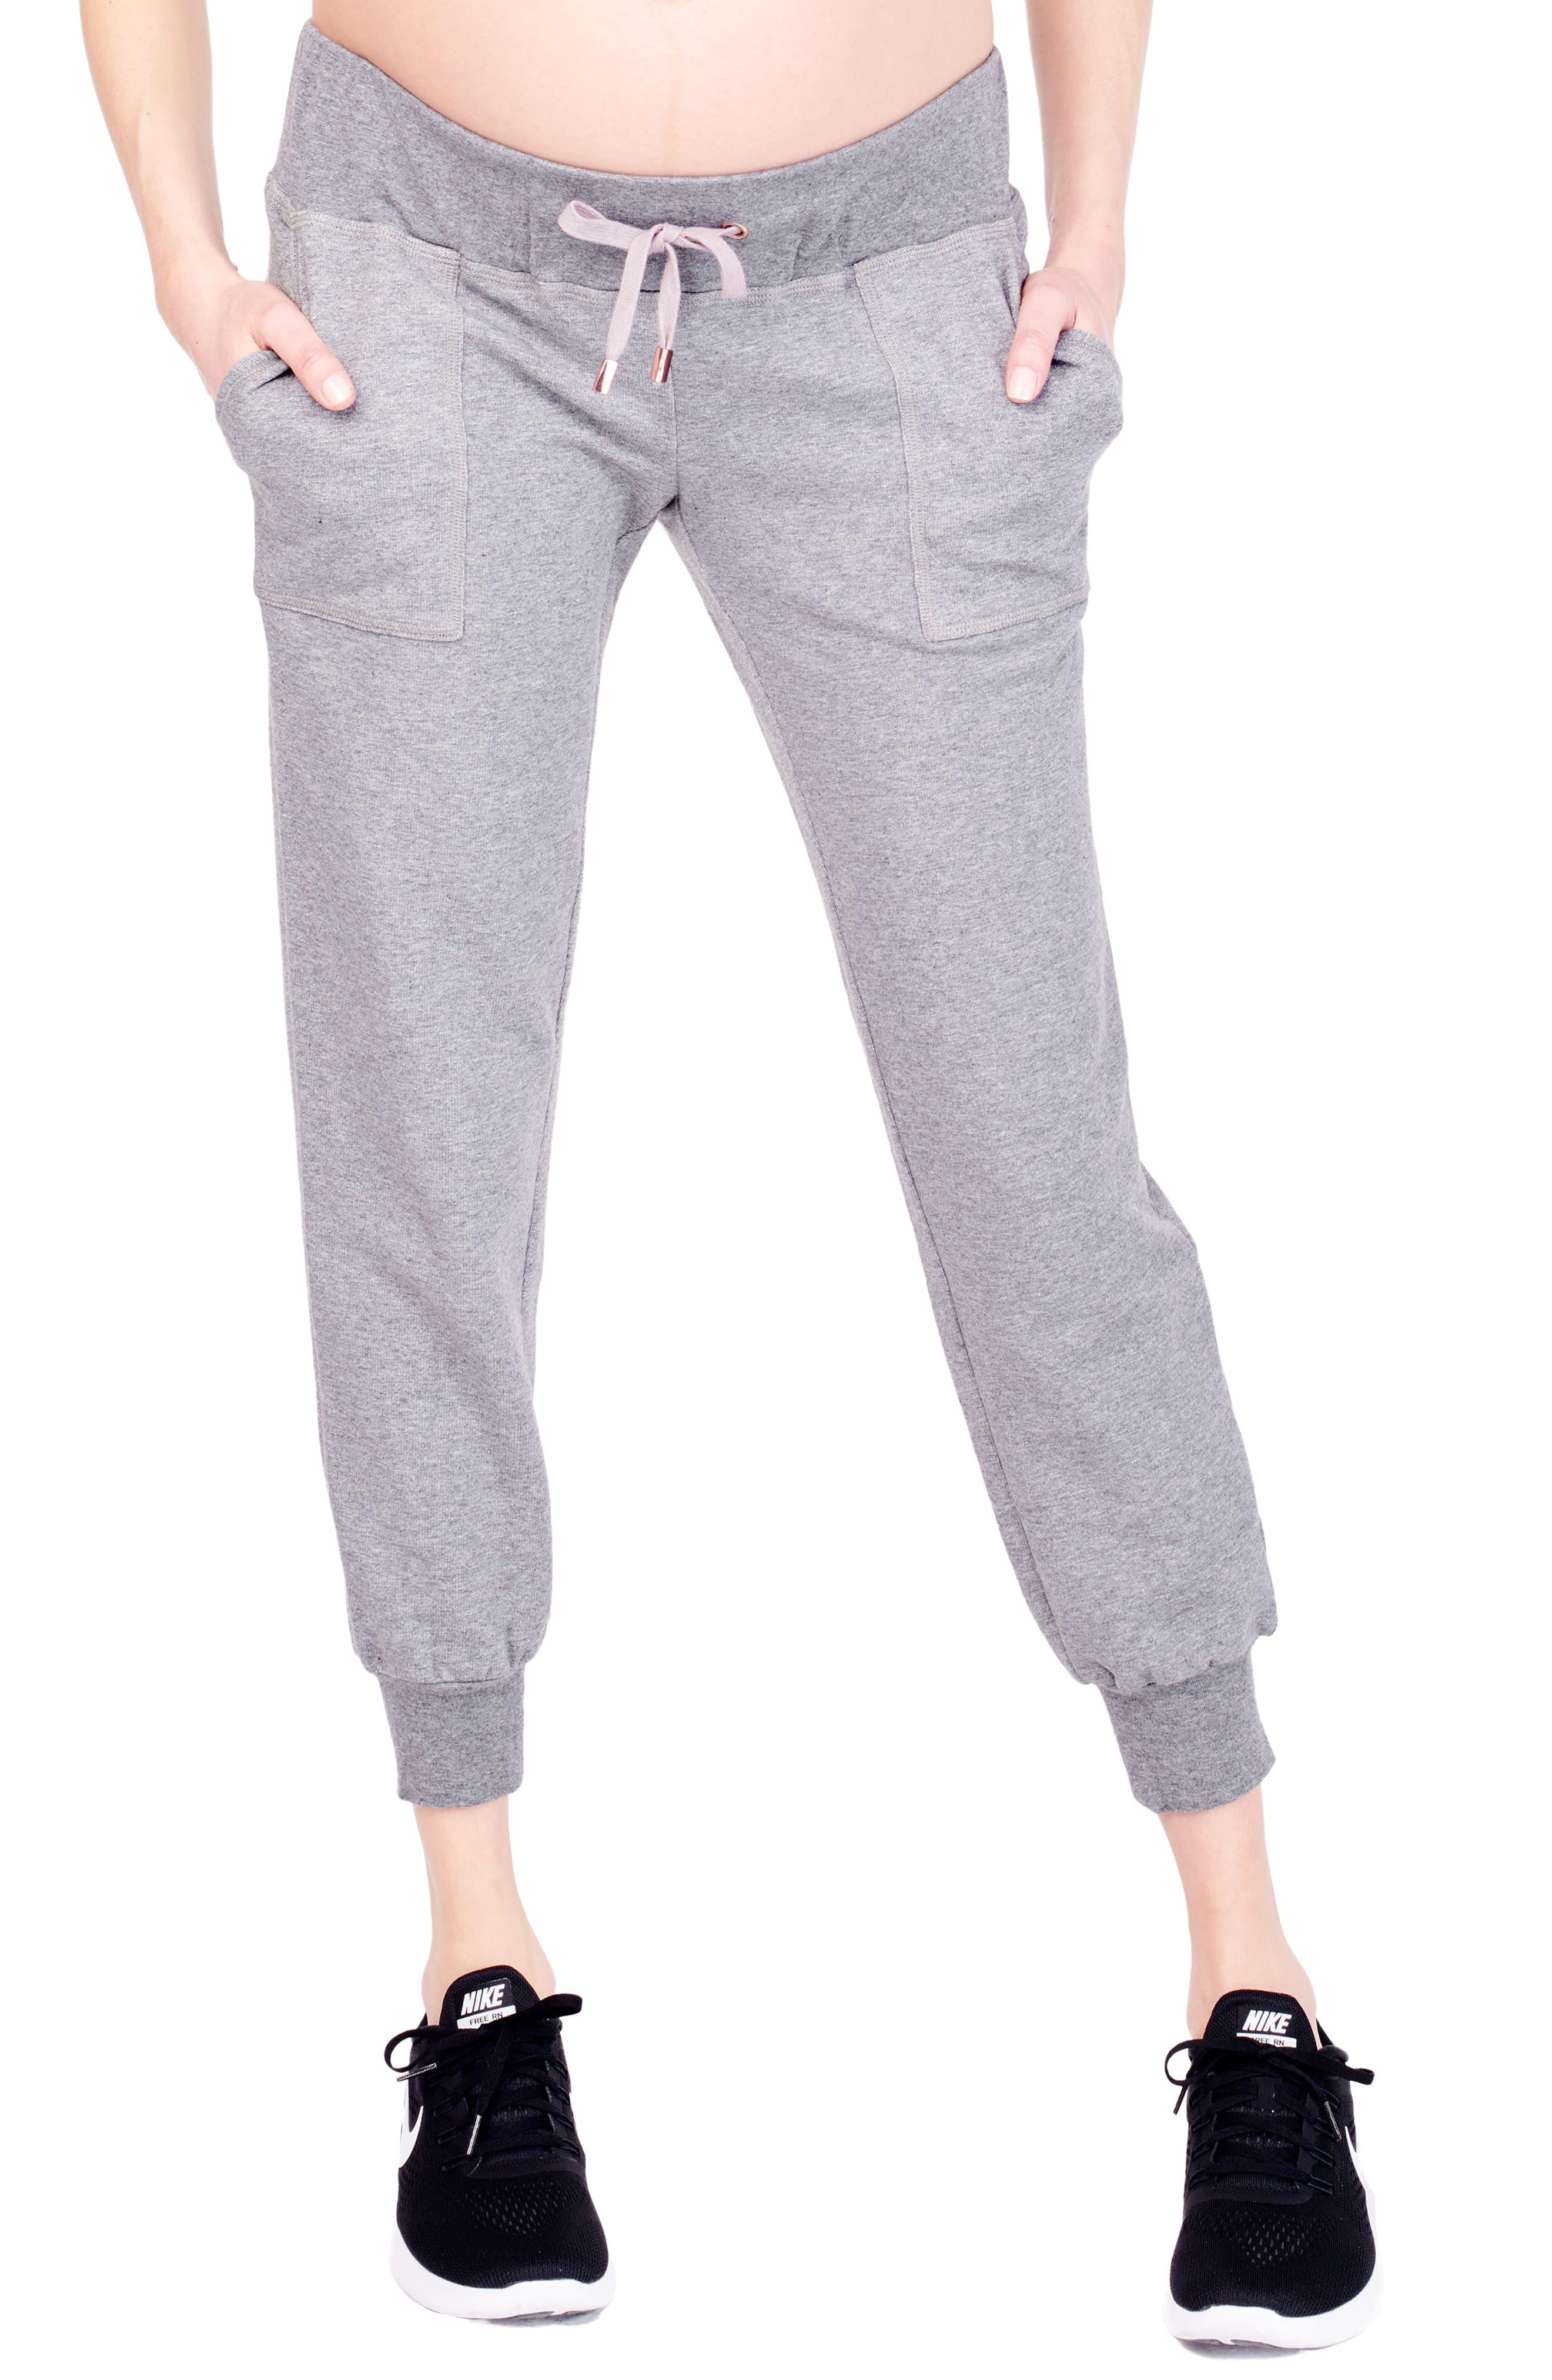 Cozy Fleece Maternity Jogger Pants,                         Main,                         color, MEDIUM GREY HEATHER